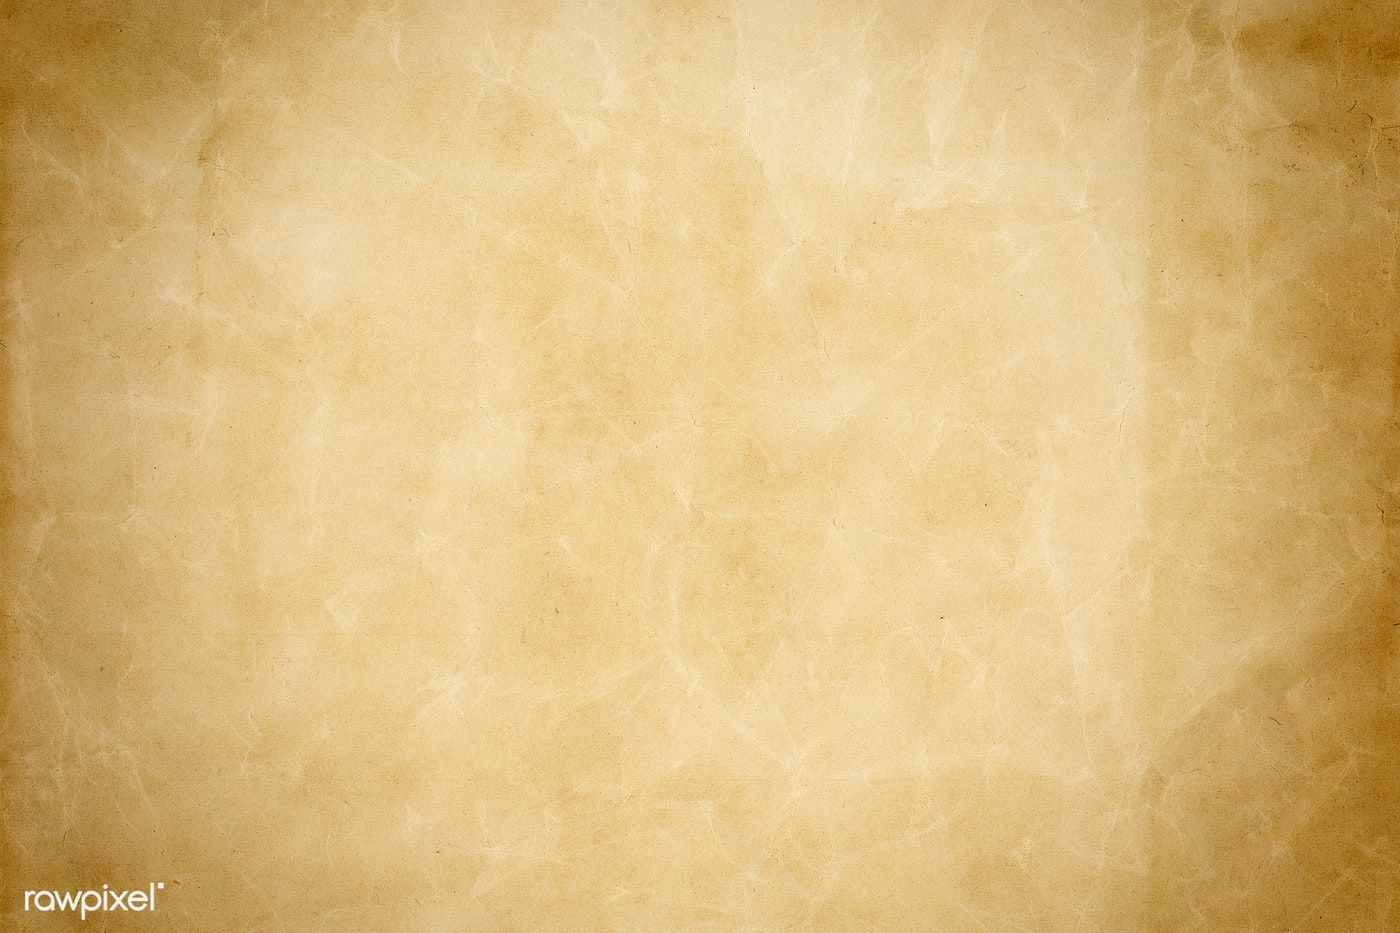 Download Premium Image Of Vintage Grungy Textured Paper Background 577362 Paper Background Texture Old Paper Background White Paper Texture Background